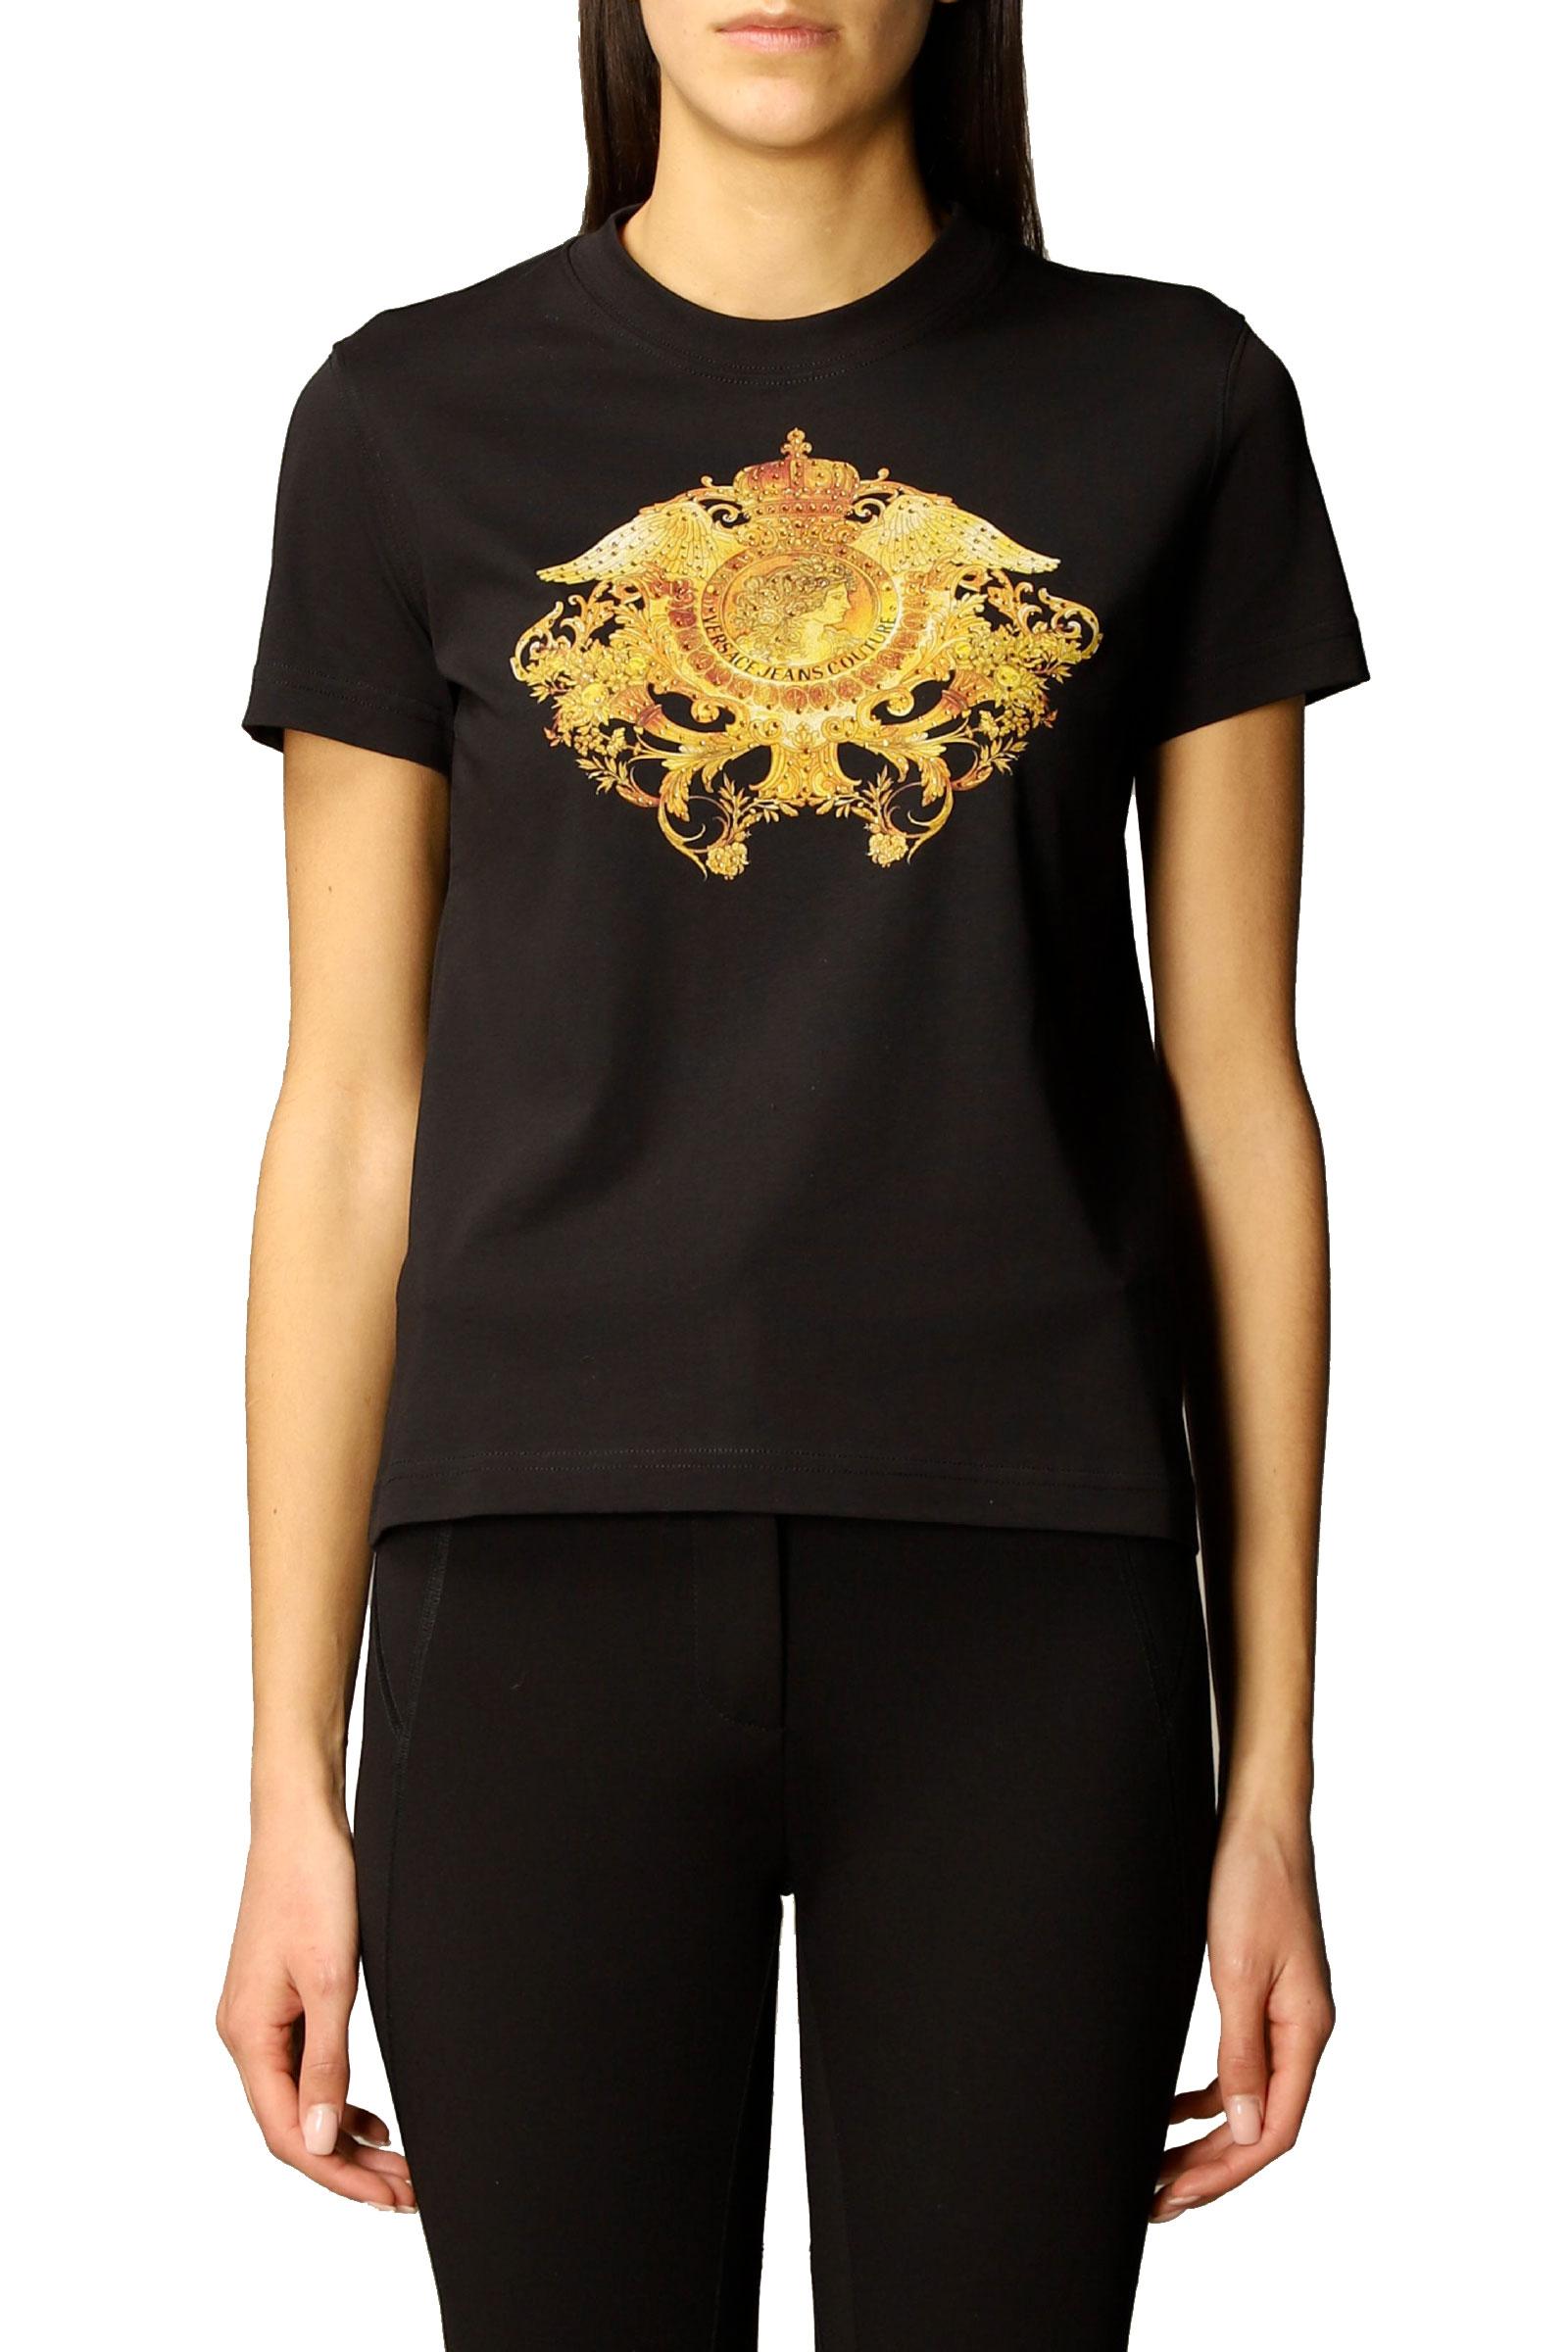 VERSACE JEANS COUTURE Women's T-Shirt VERSACE JEANS COUTURE | T-Shirt | B2HWA72911620899